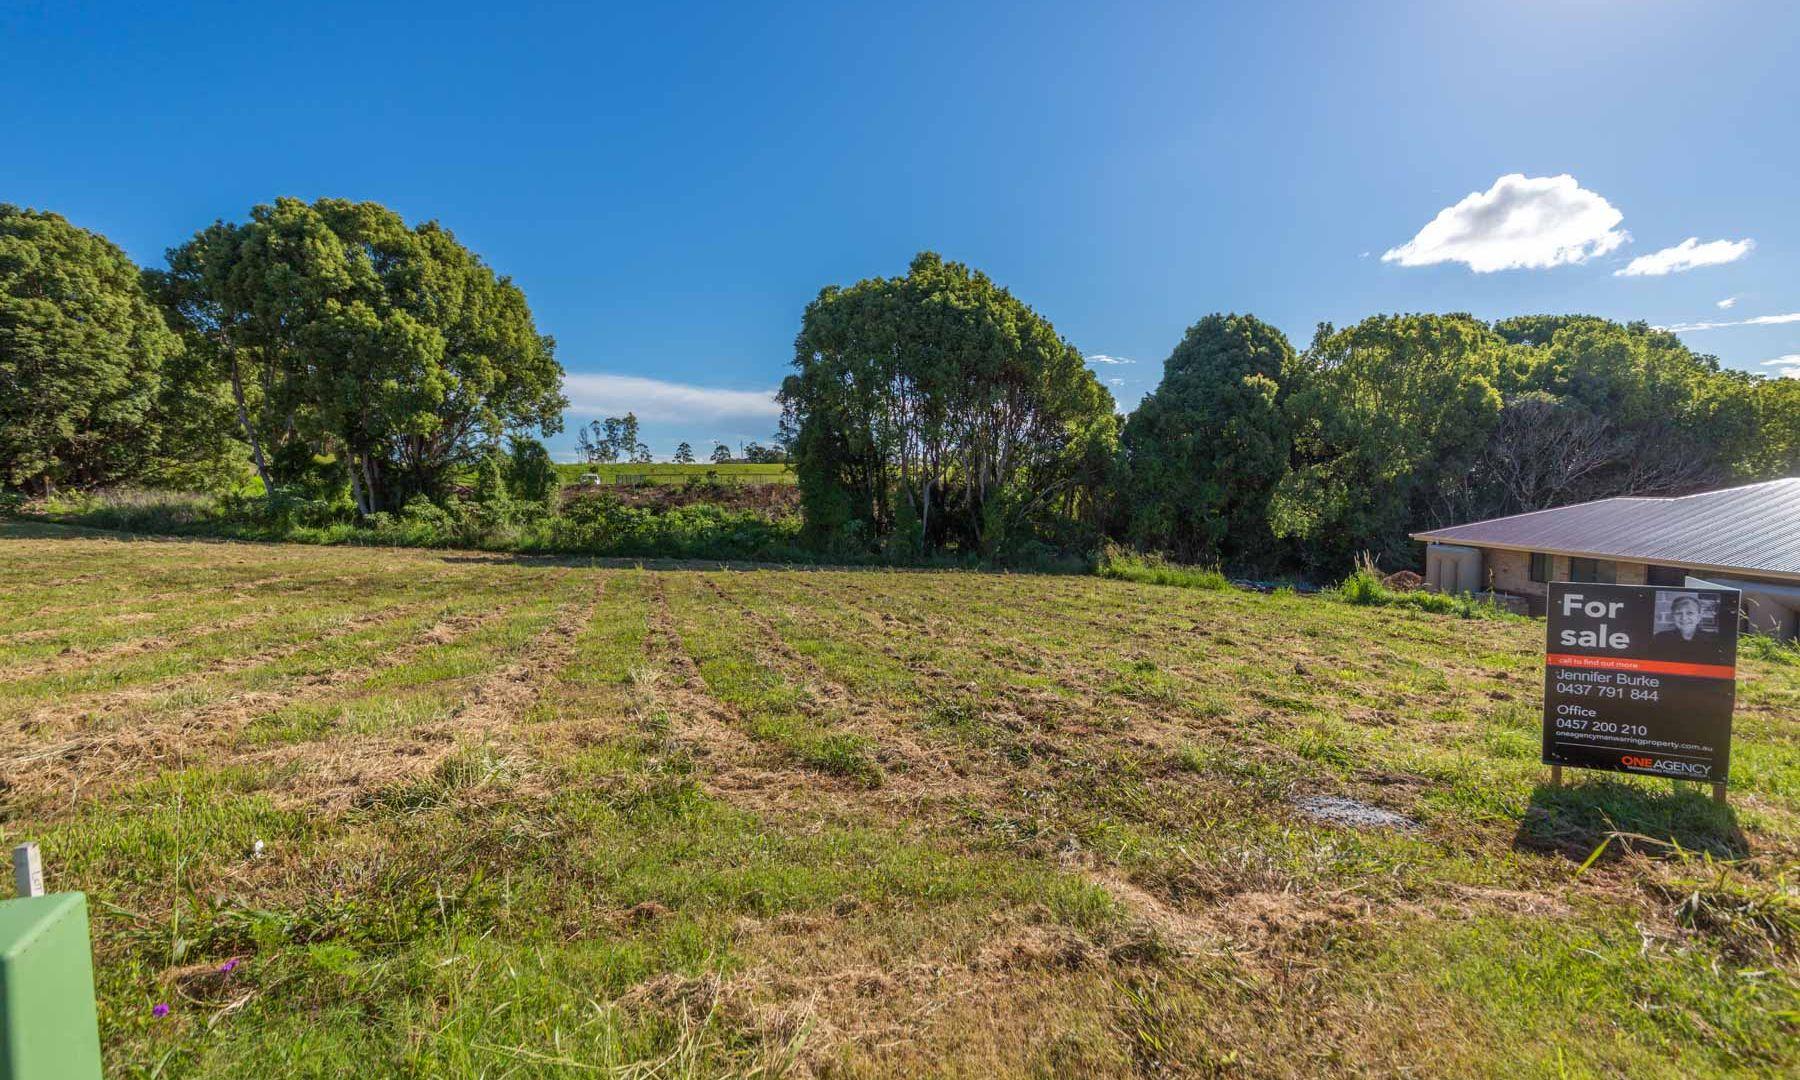 Lot 10 3 Earls Court, Goonellabah NSW 2480, Image 2